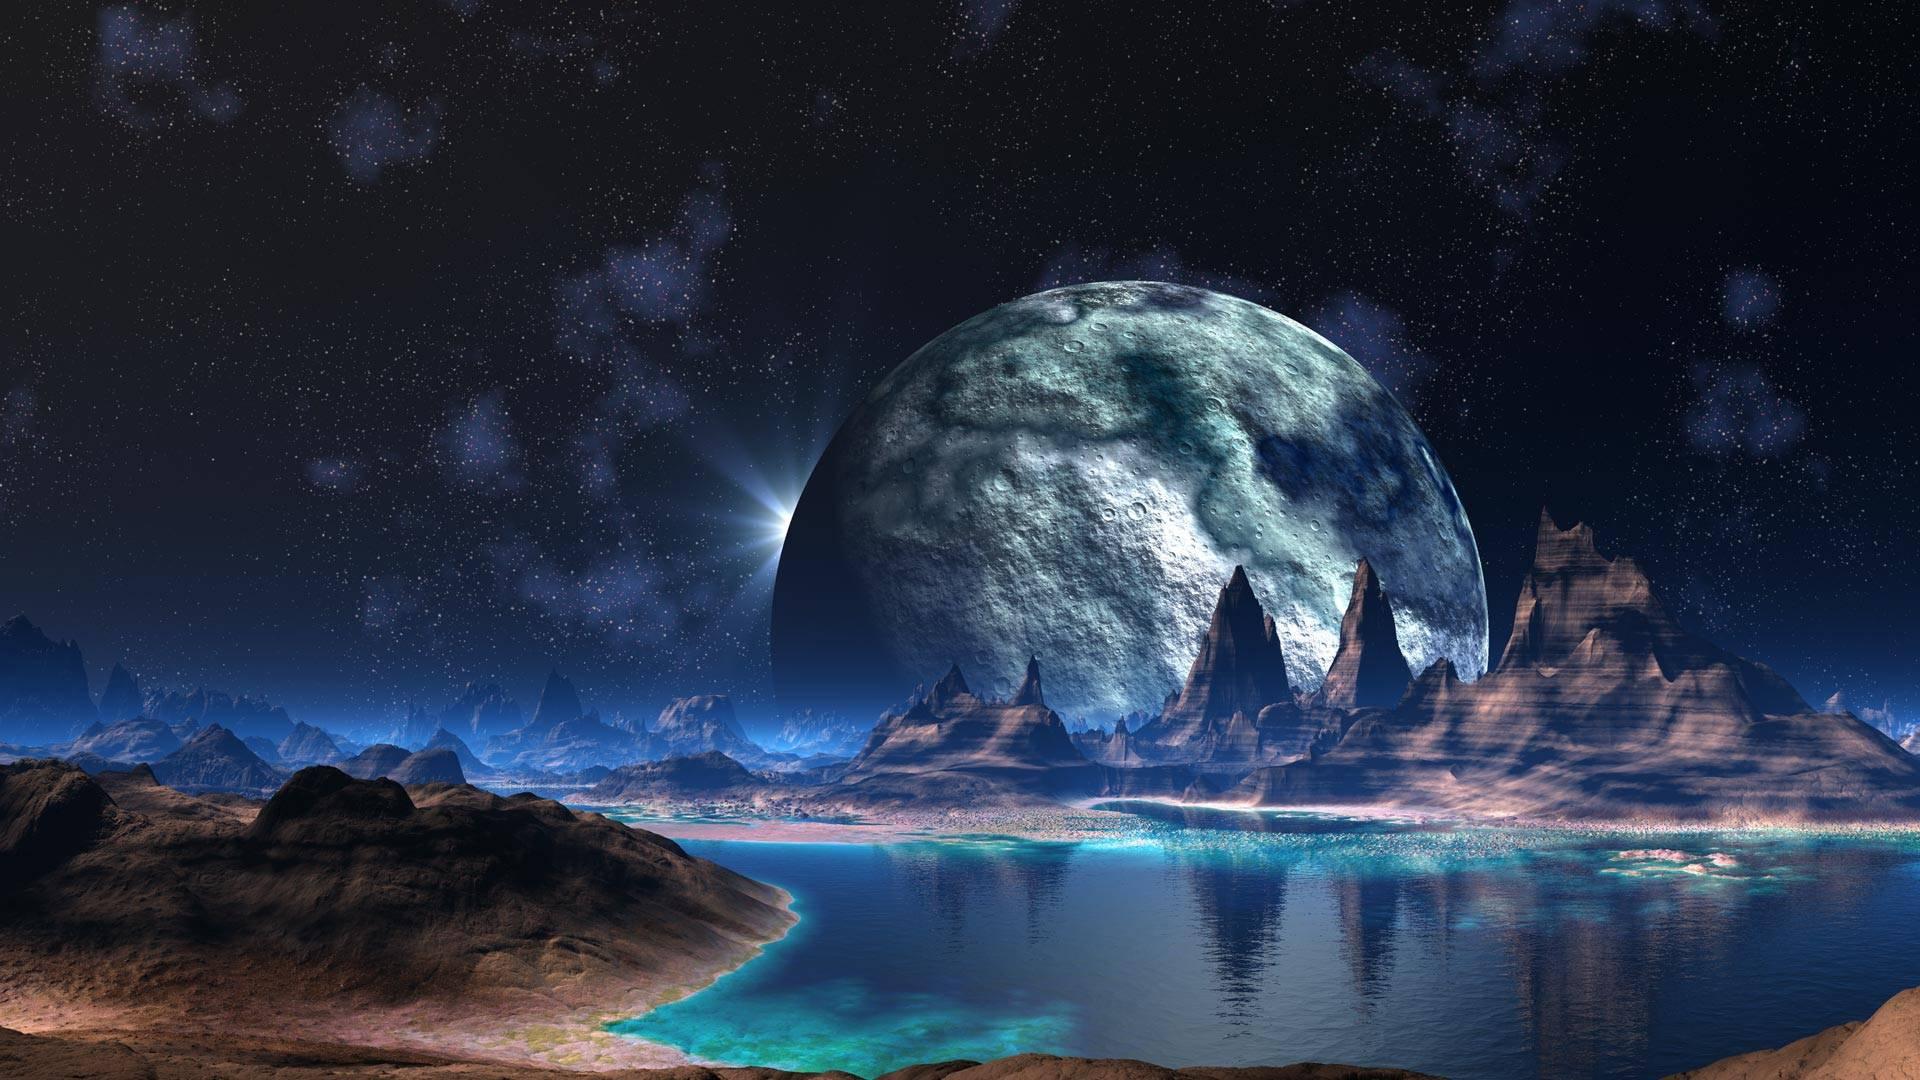 Stars Lake sci fi space reflection mountains wallpaper background 1920x1080